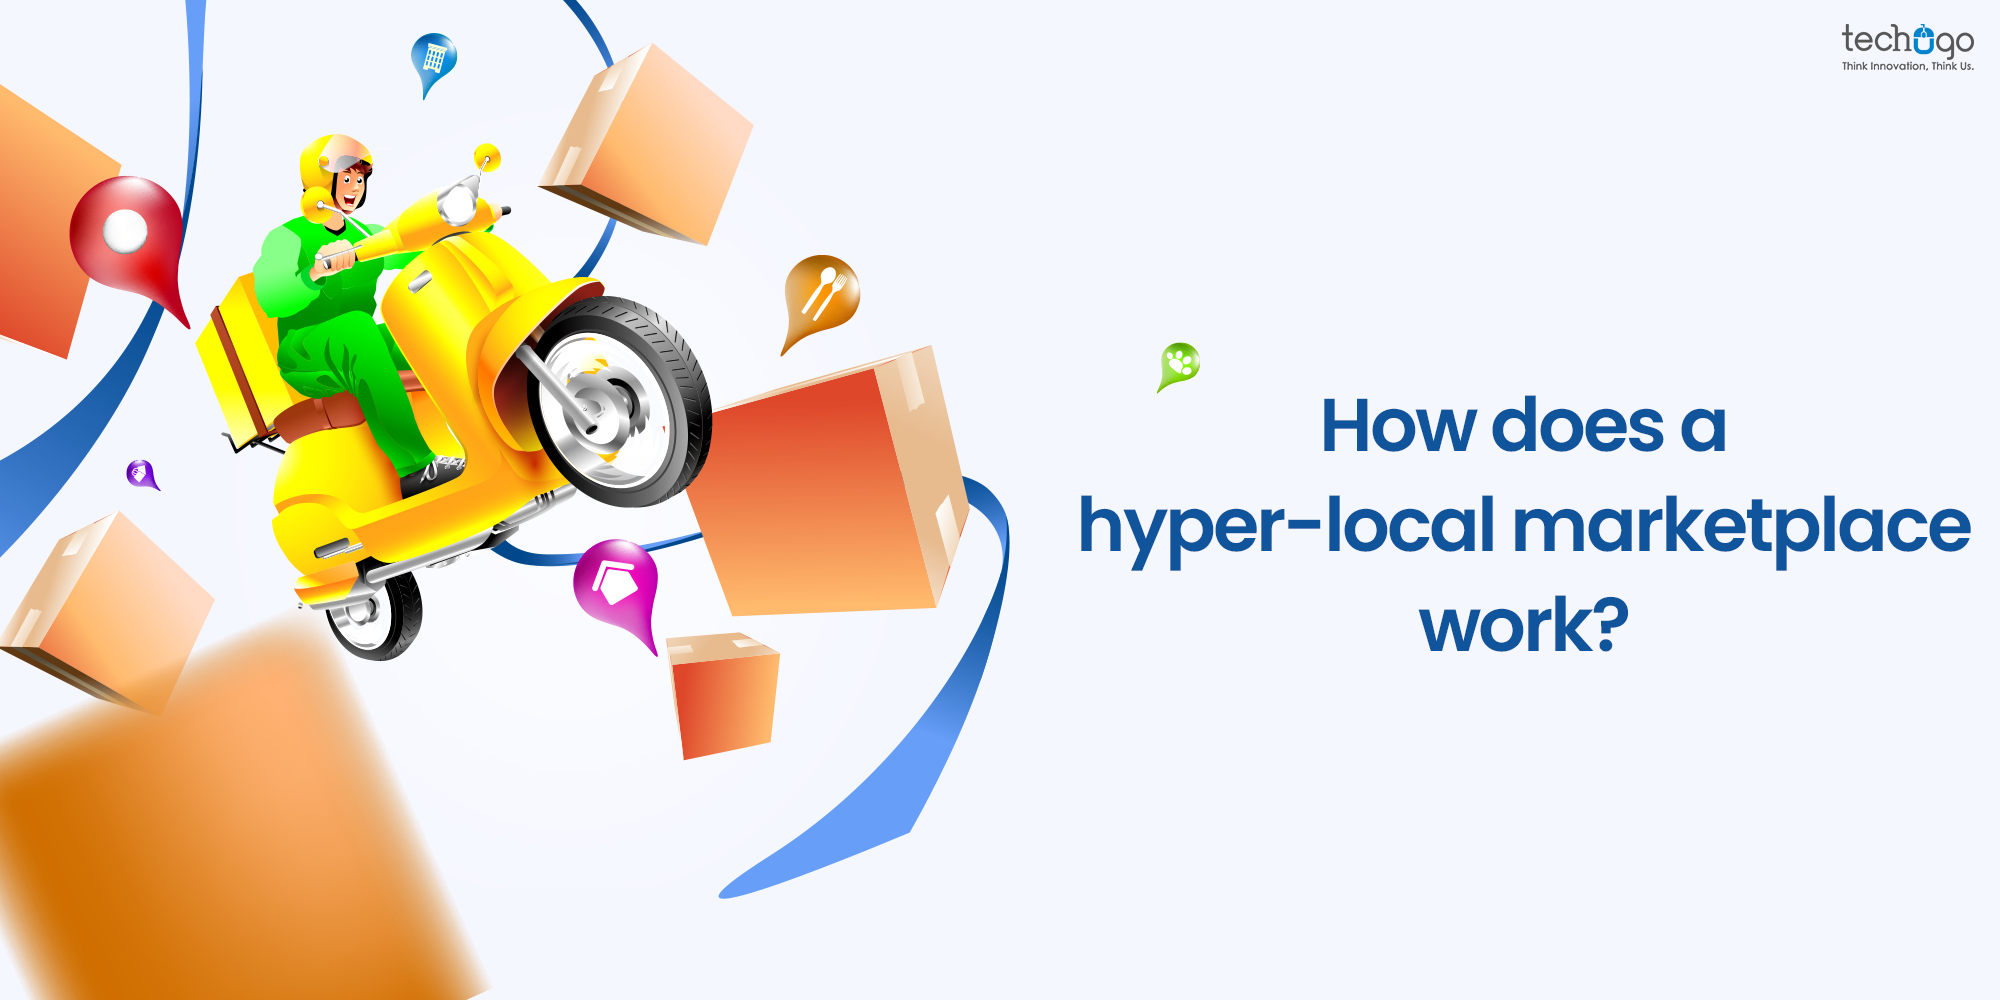 hyper-local marketplace work